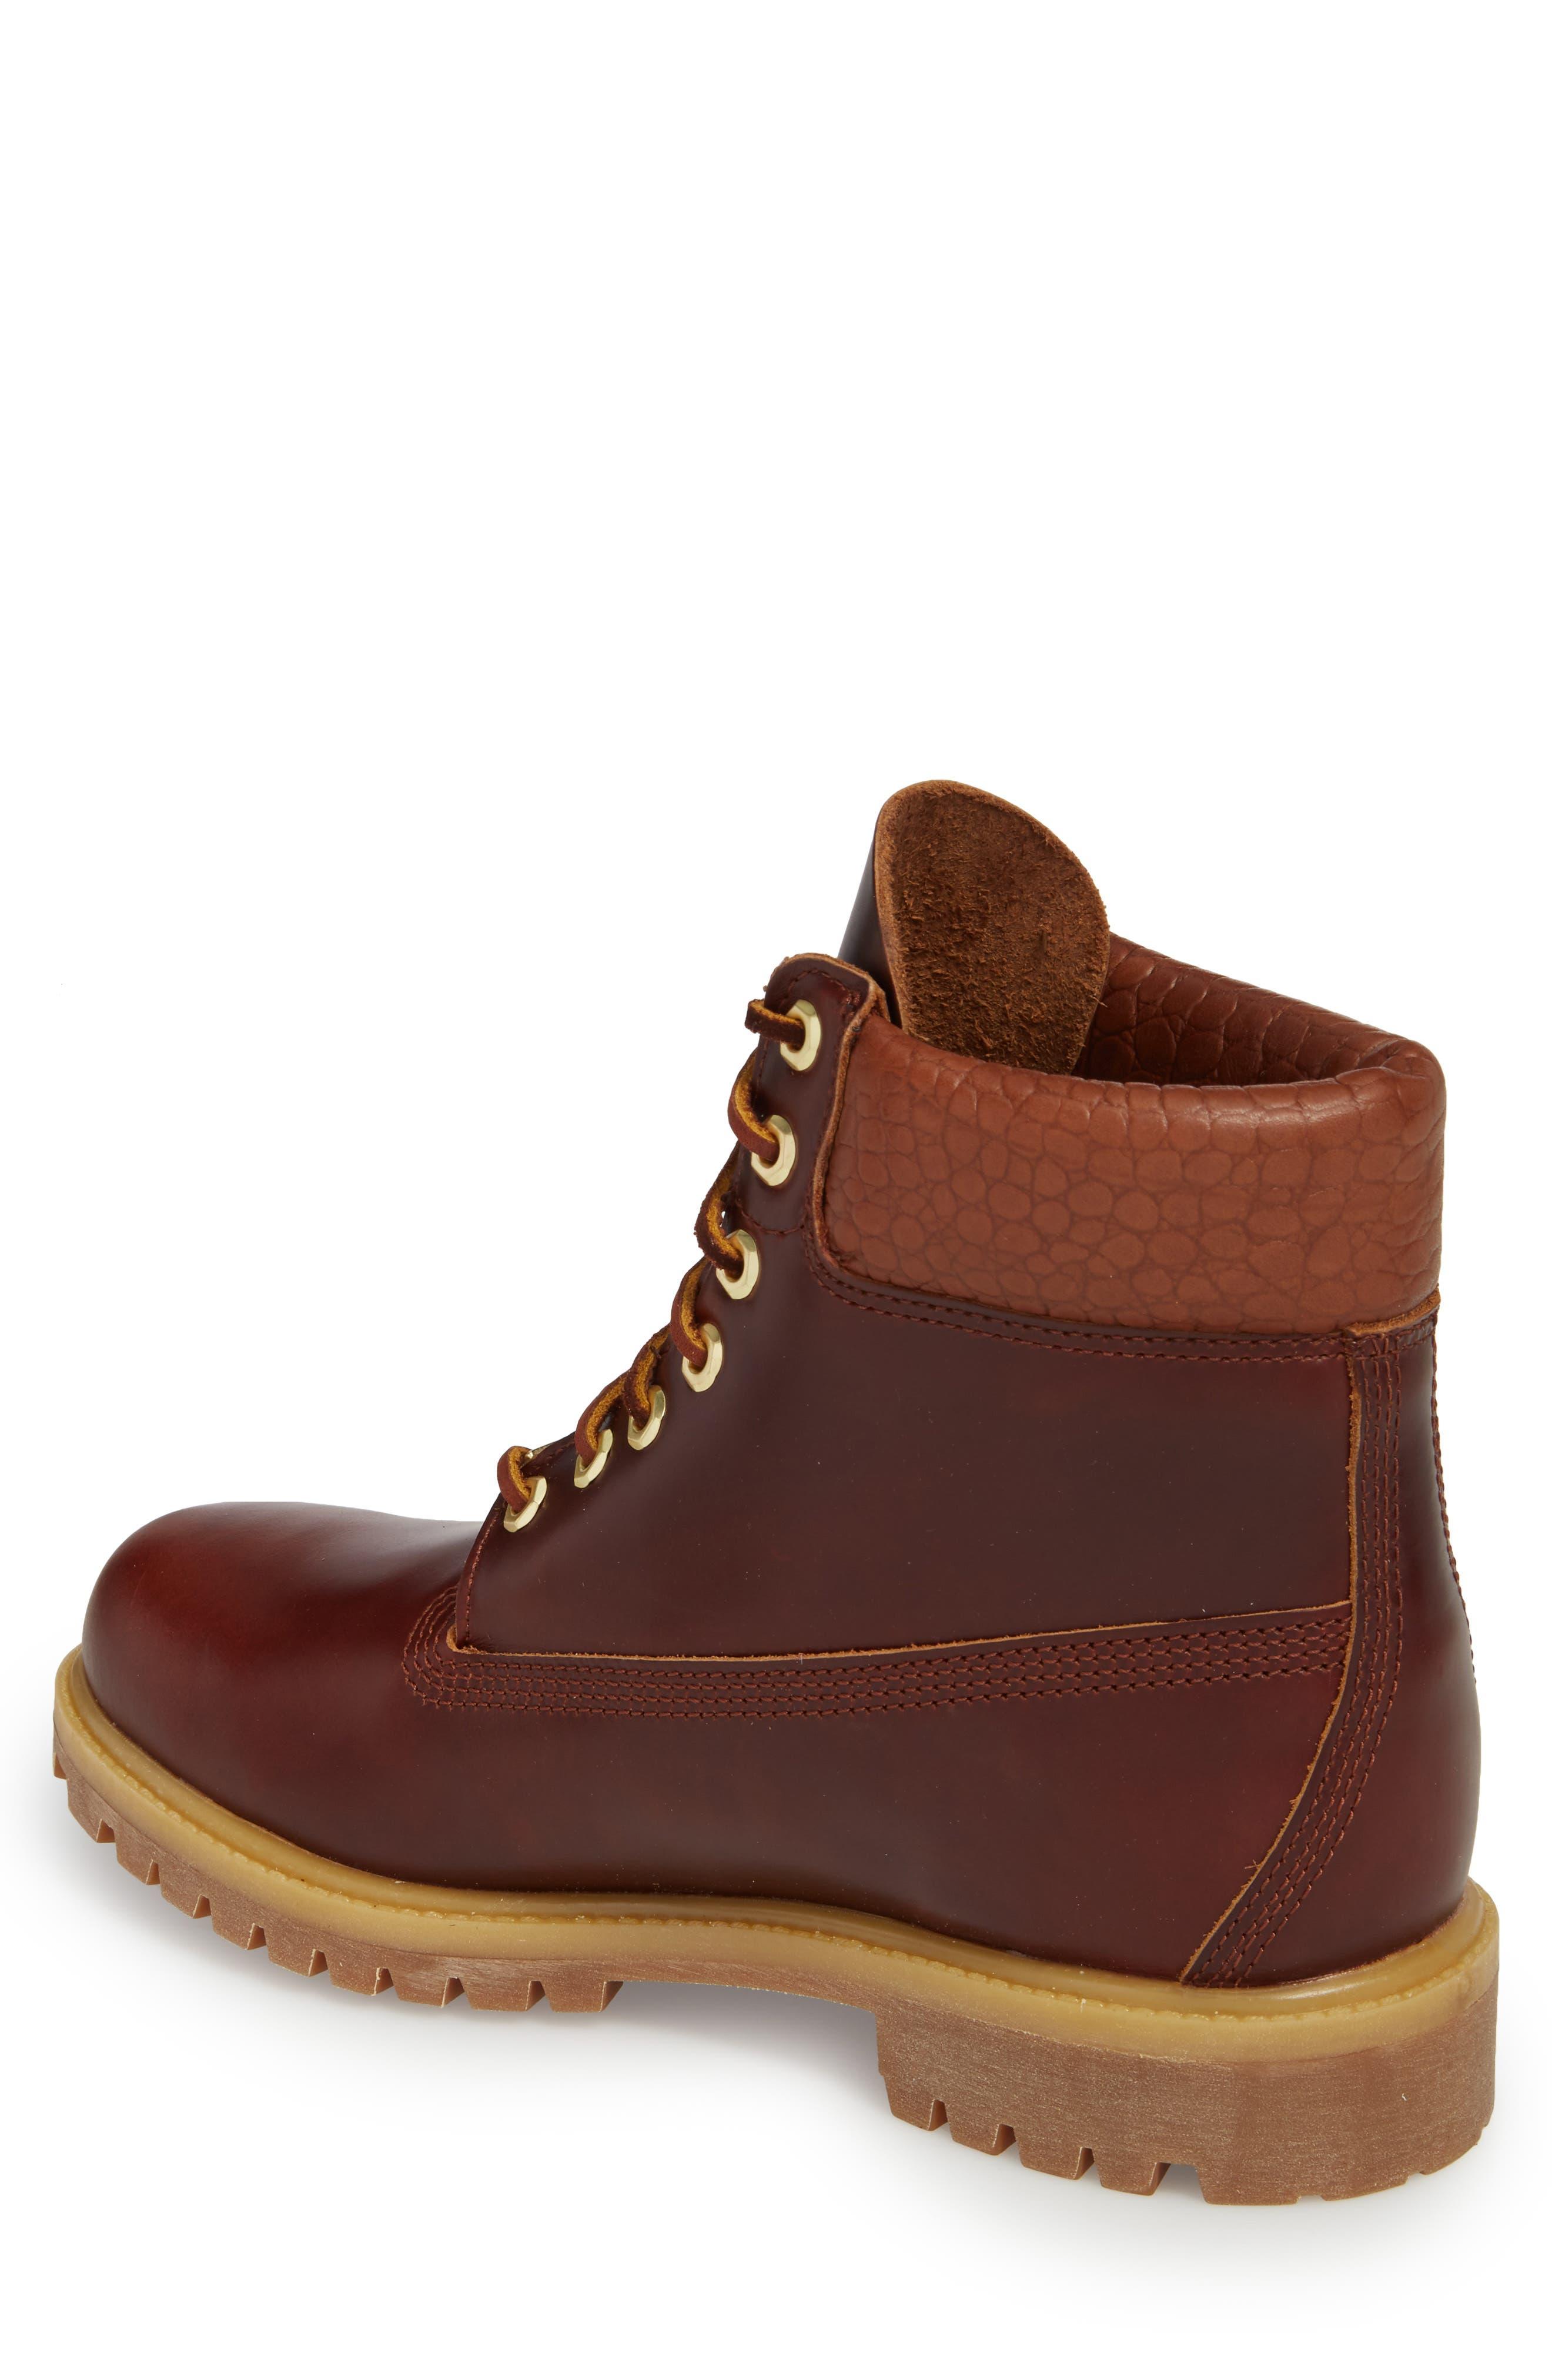 Premium Waterproof PrimaLoft<sup>®</sup> Insulated Boot,                             Alternate thumbnail 2, color,                             210